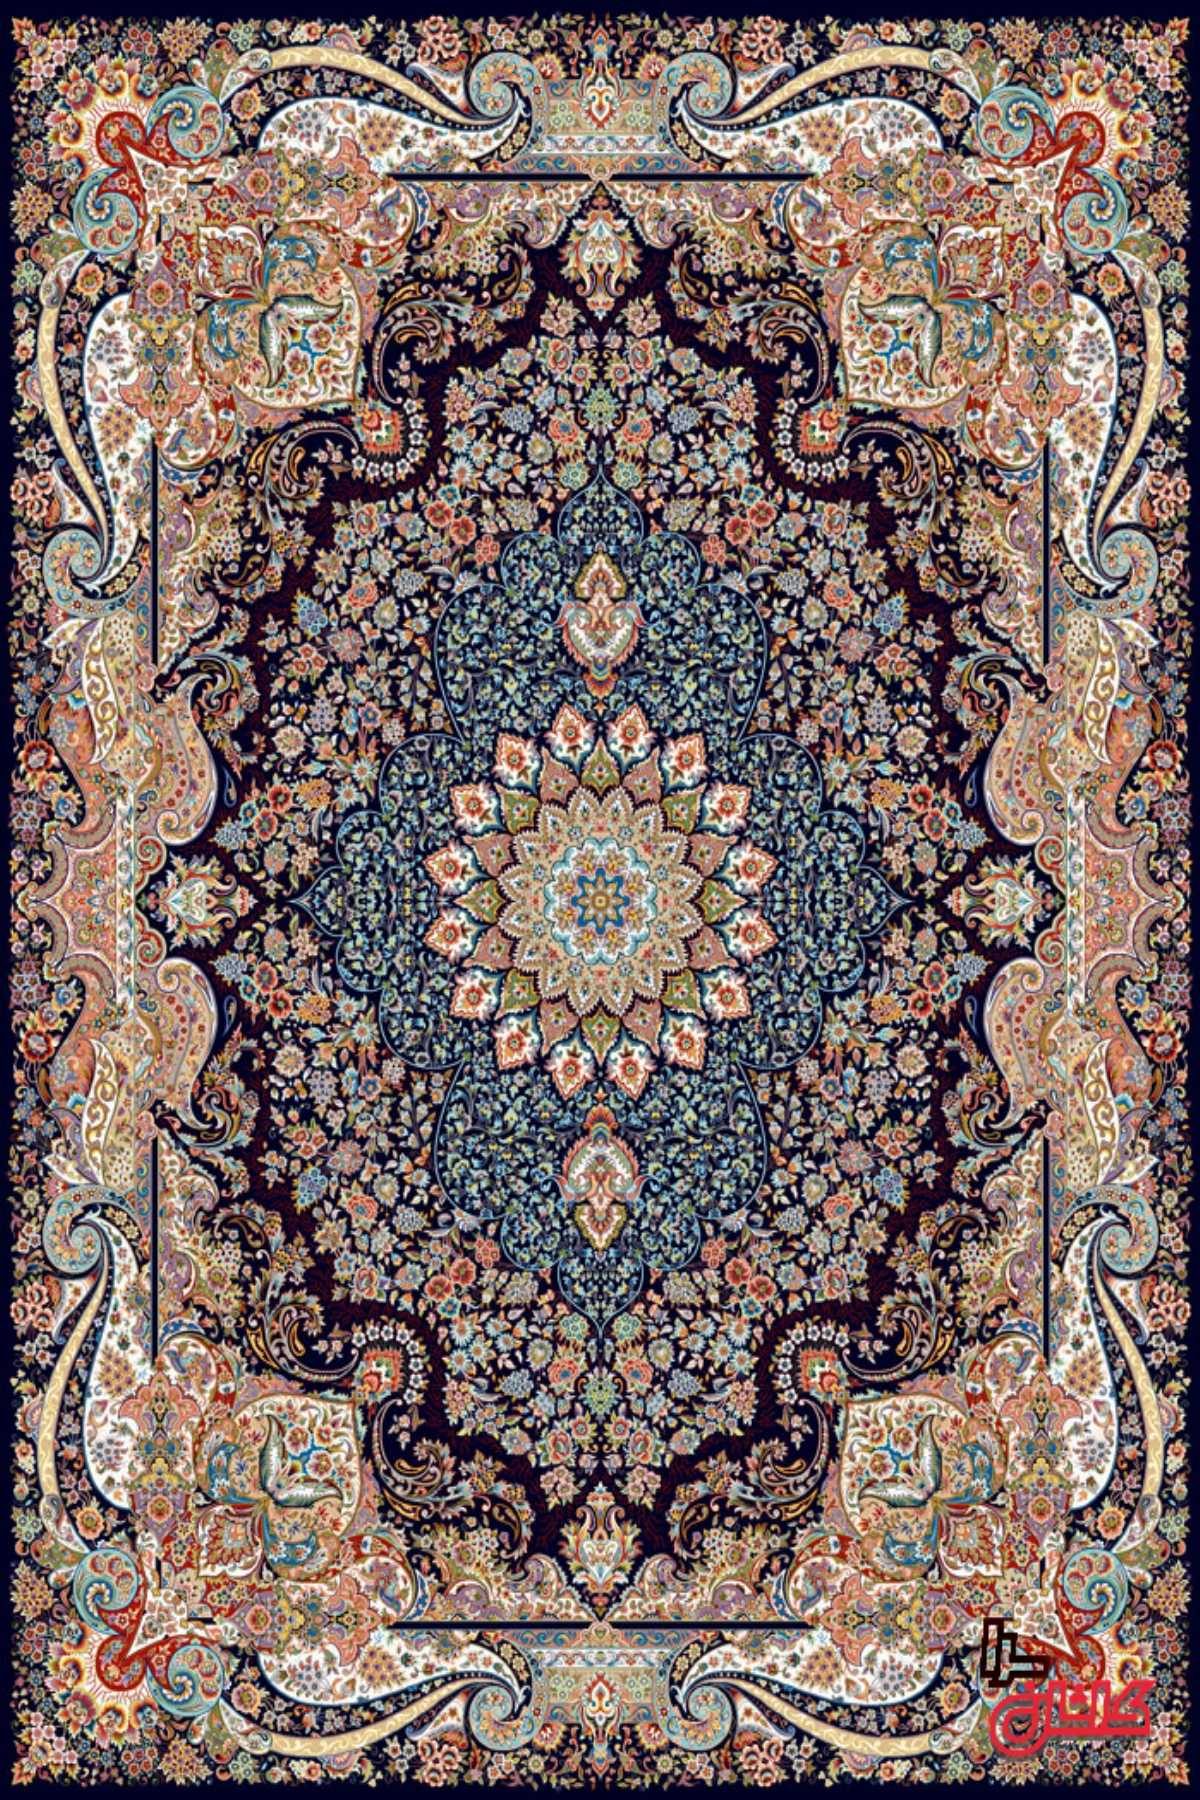 Iranmehr-Ayda_12m_S2_2550-700